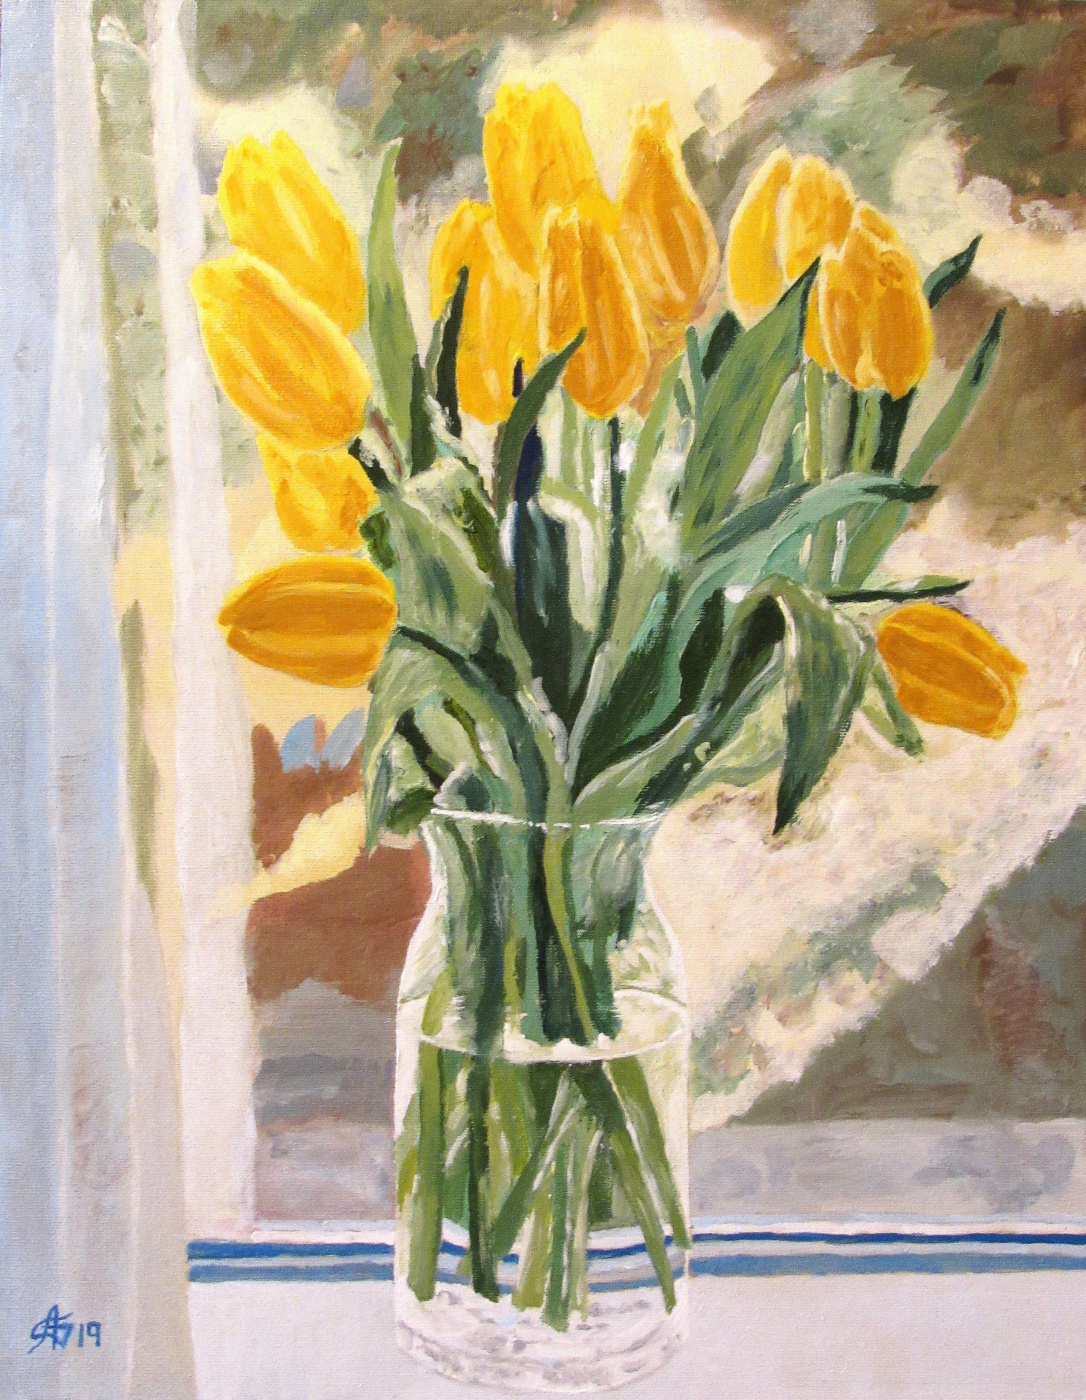 Арташес Владимирович Бадалян. Window bouquet - x-kart.-m - 45x35